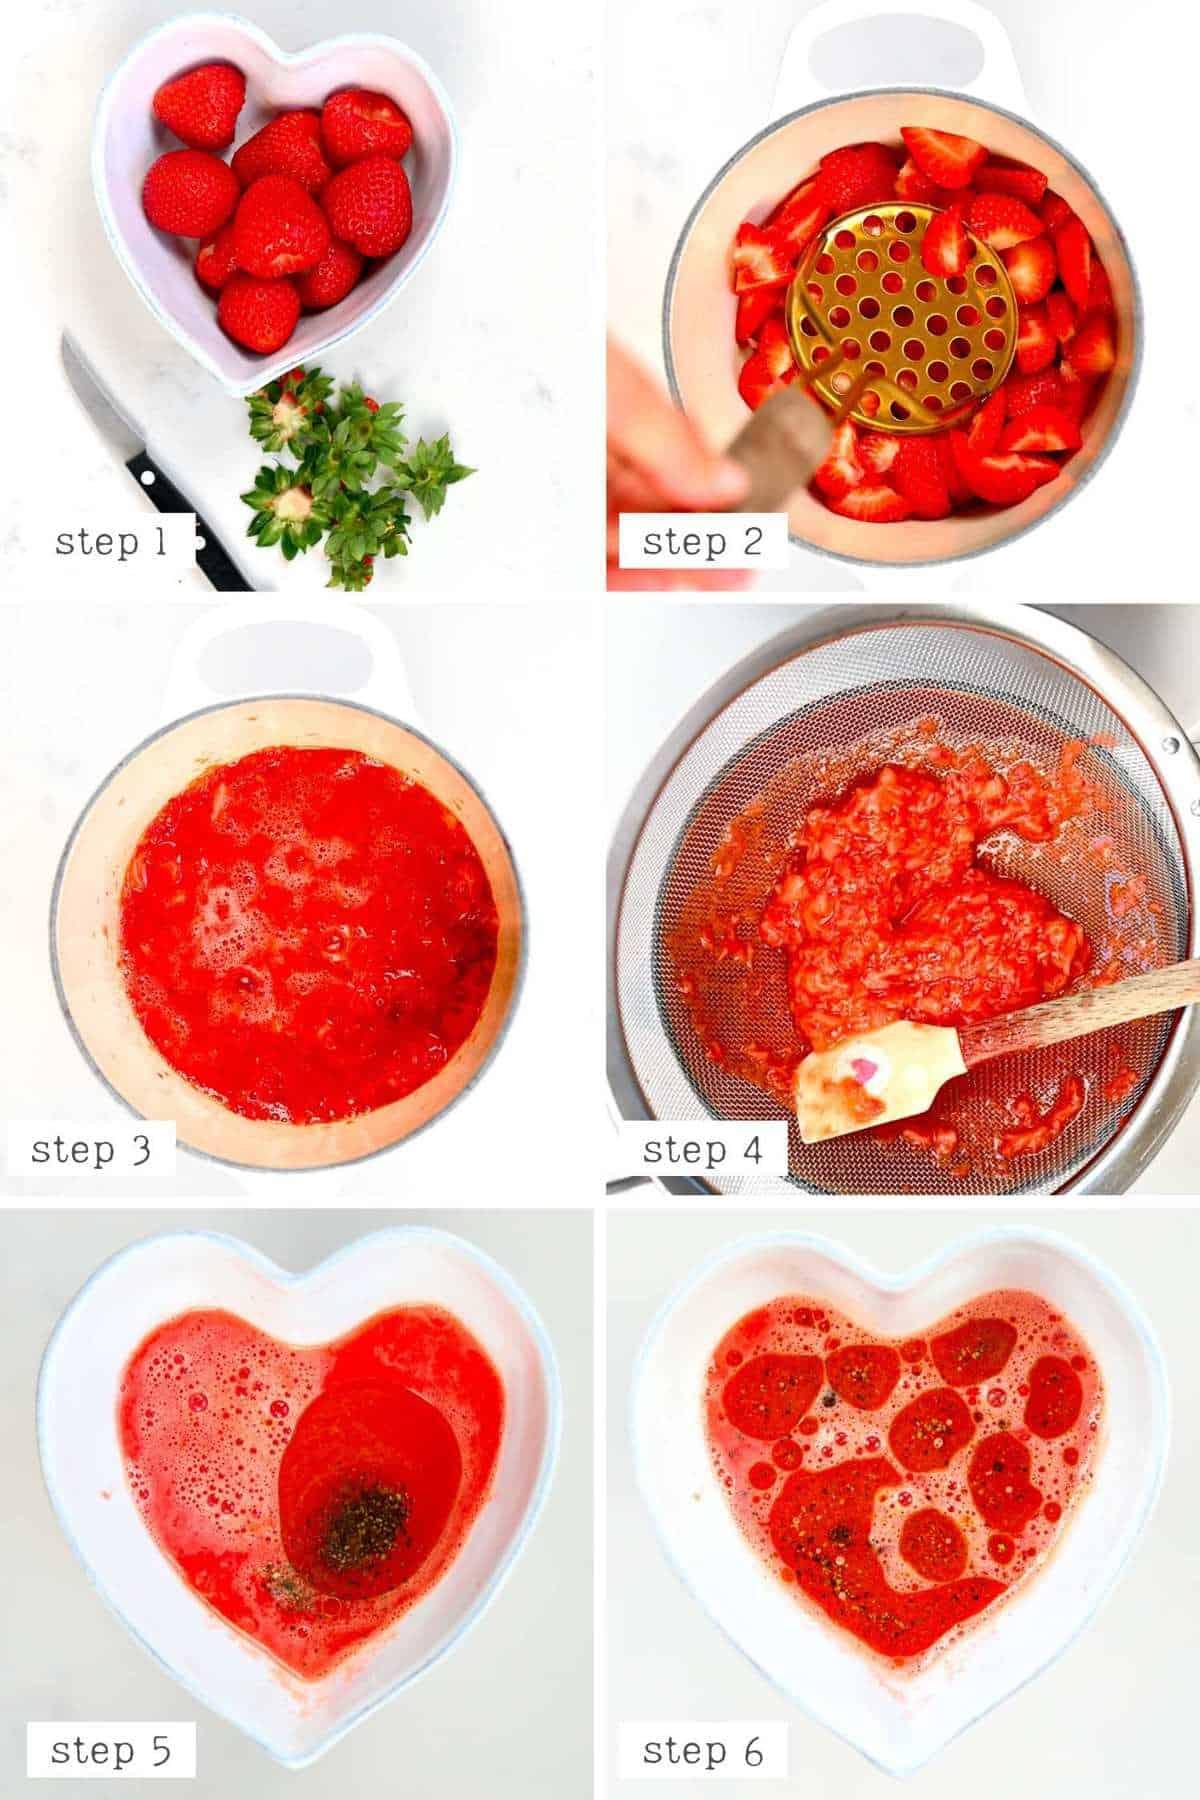 Steps to make Strawberry salad dressing